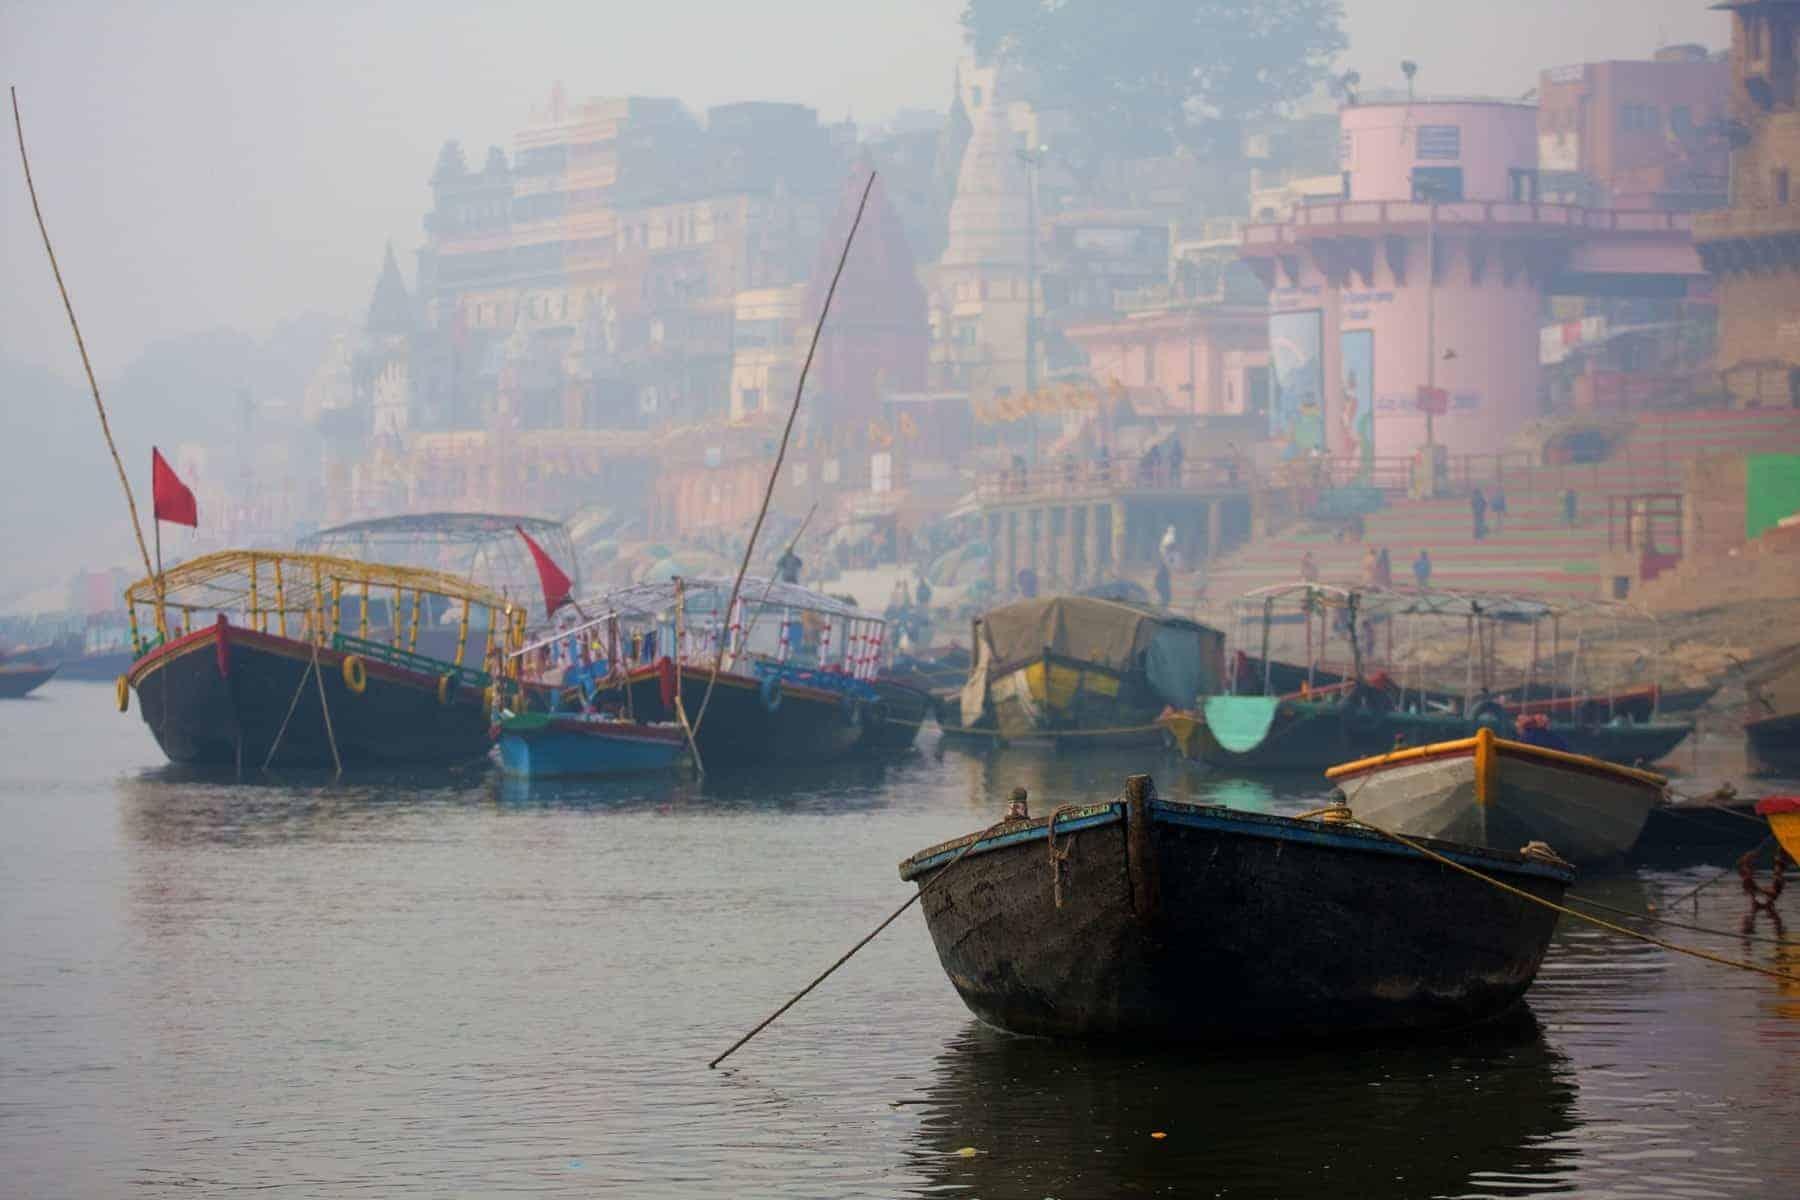 View of Varanasi city in India